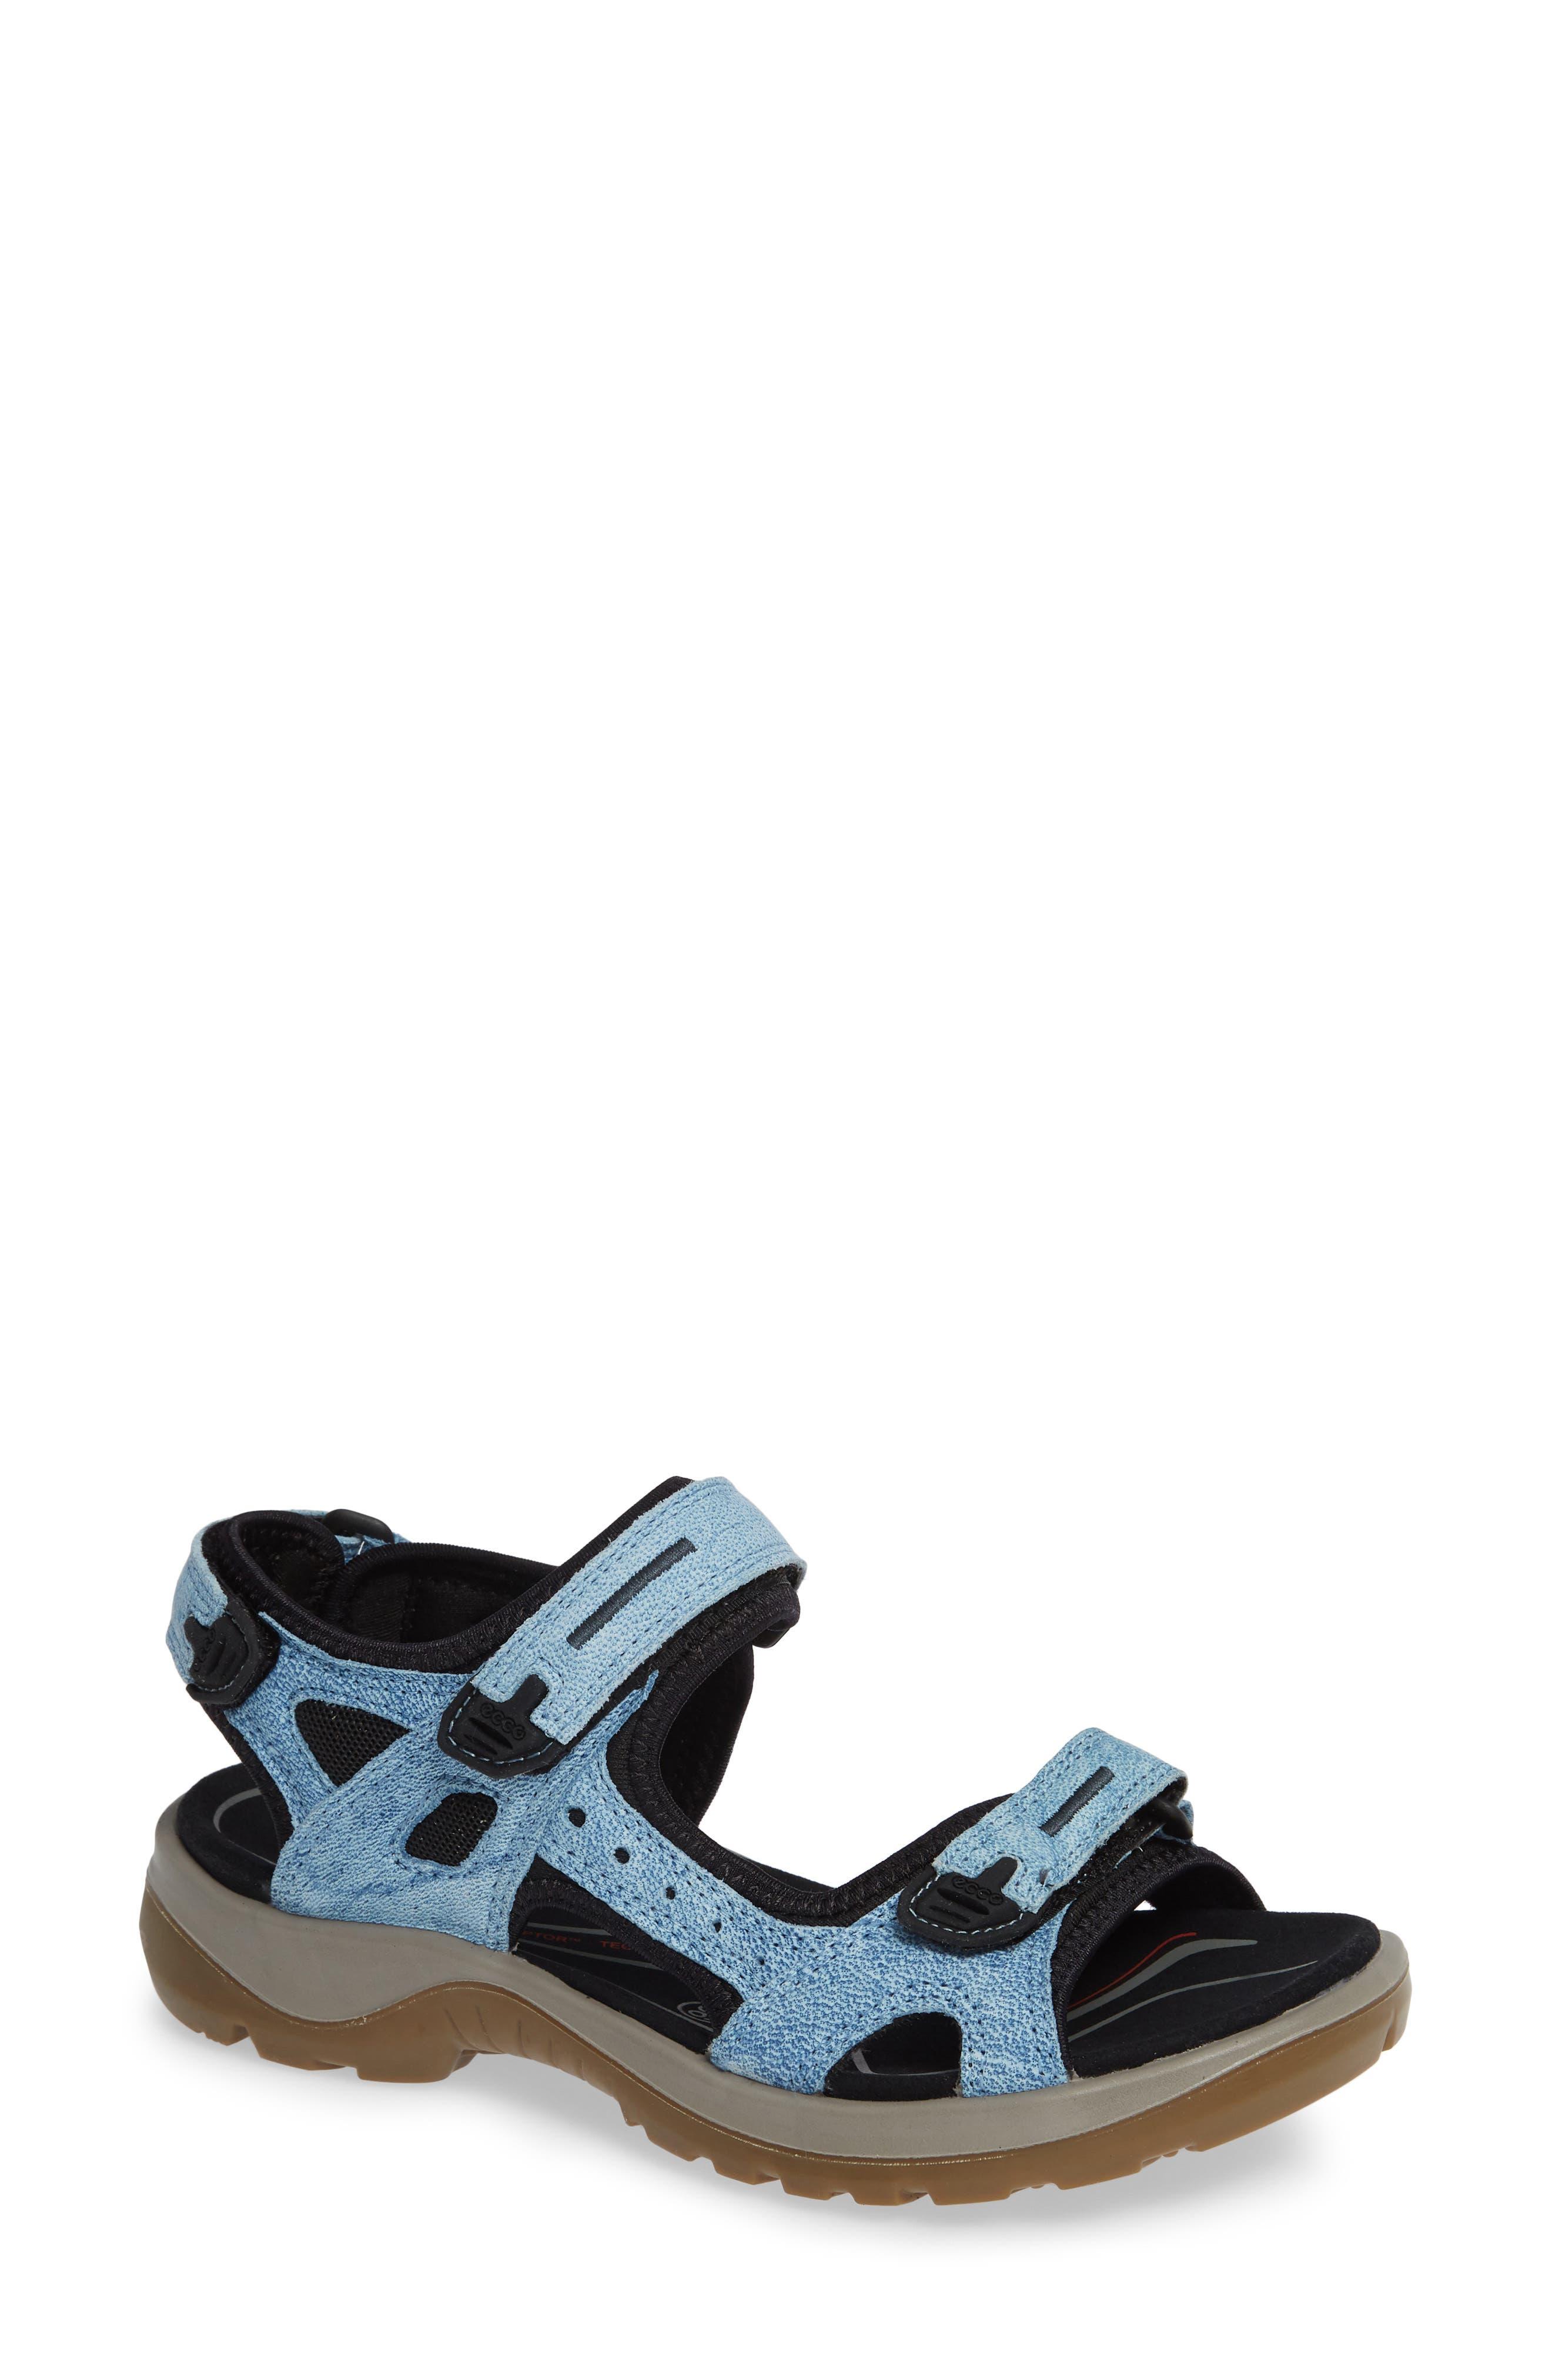 Offroad Sandal,                         Main,                         color, 459